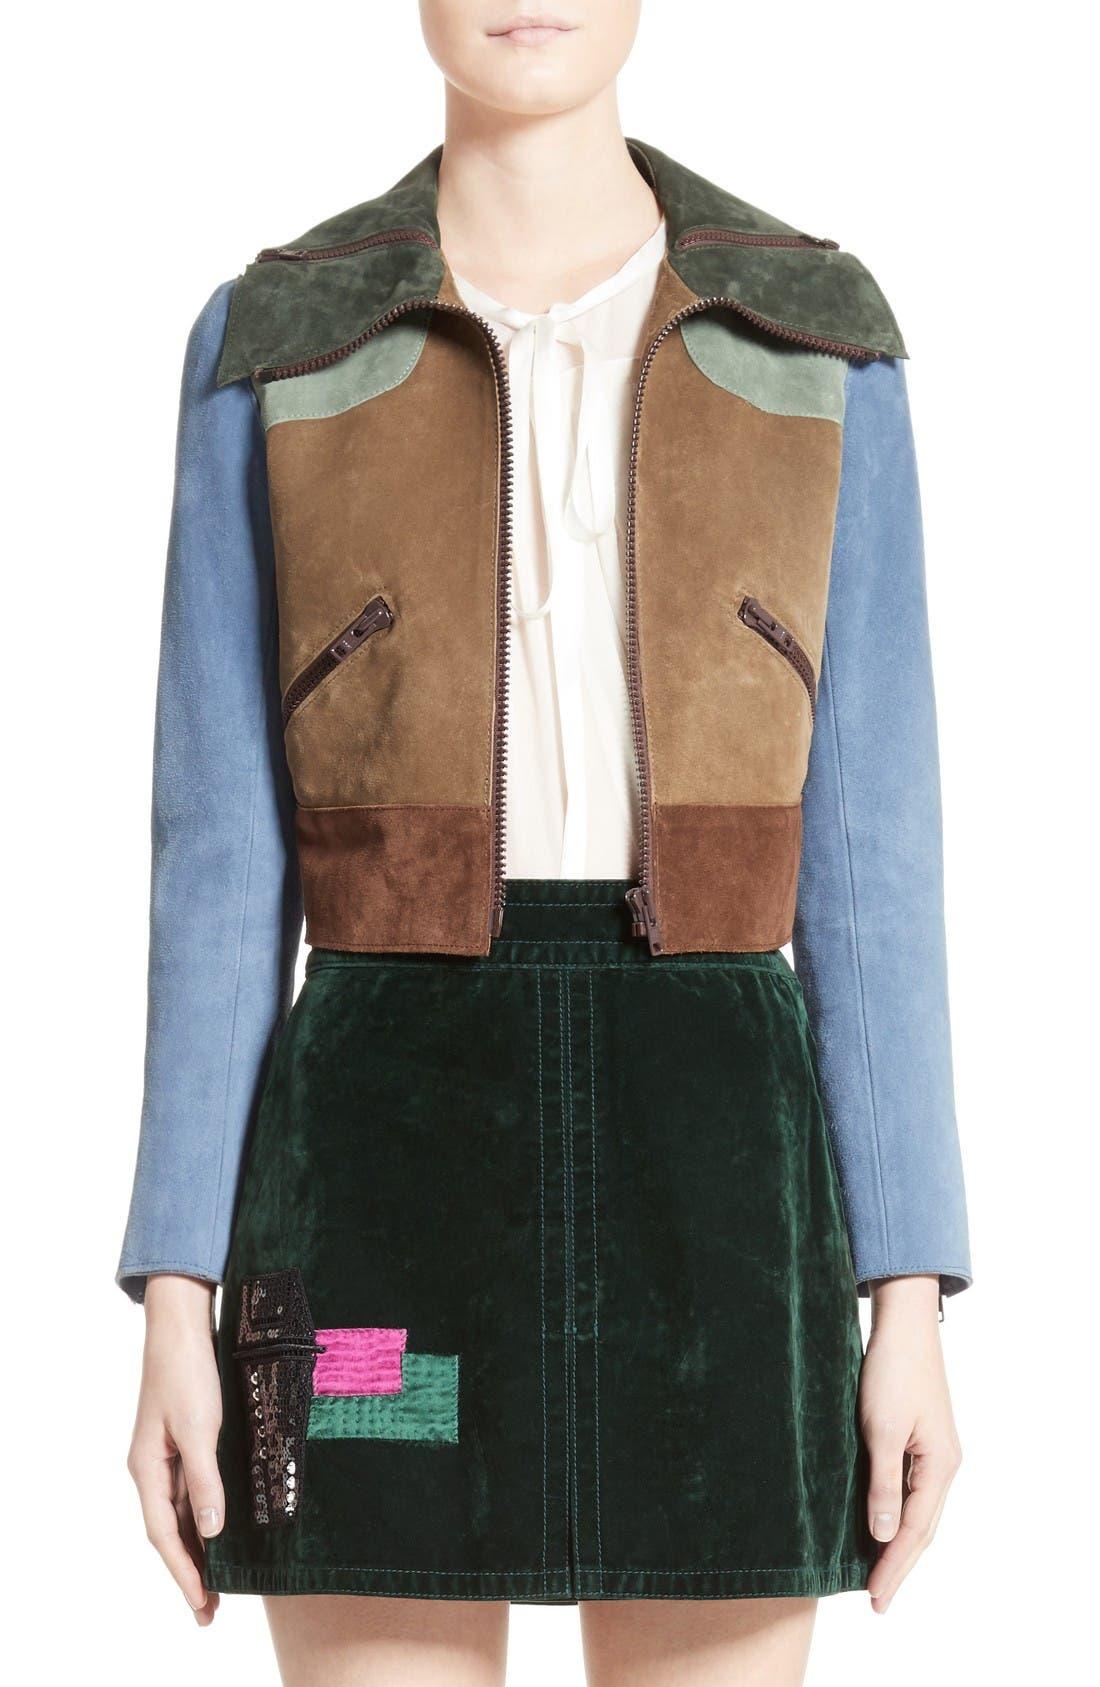 Alternate Image 1 Selected - MARC JACOBS Suede Patchwork Jacket